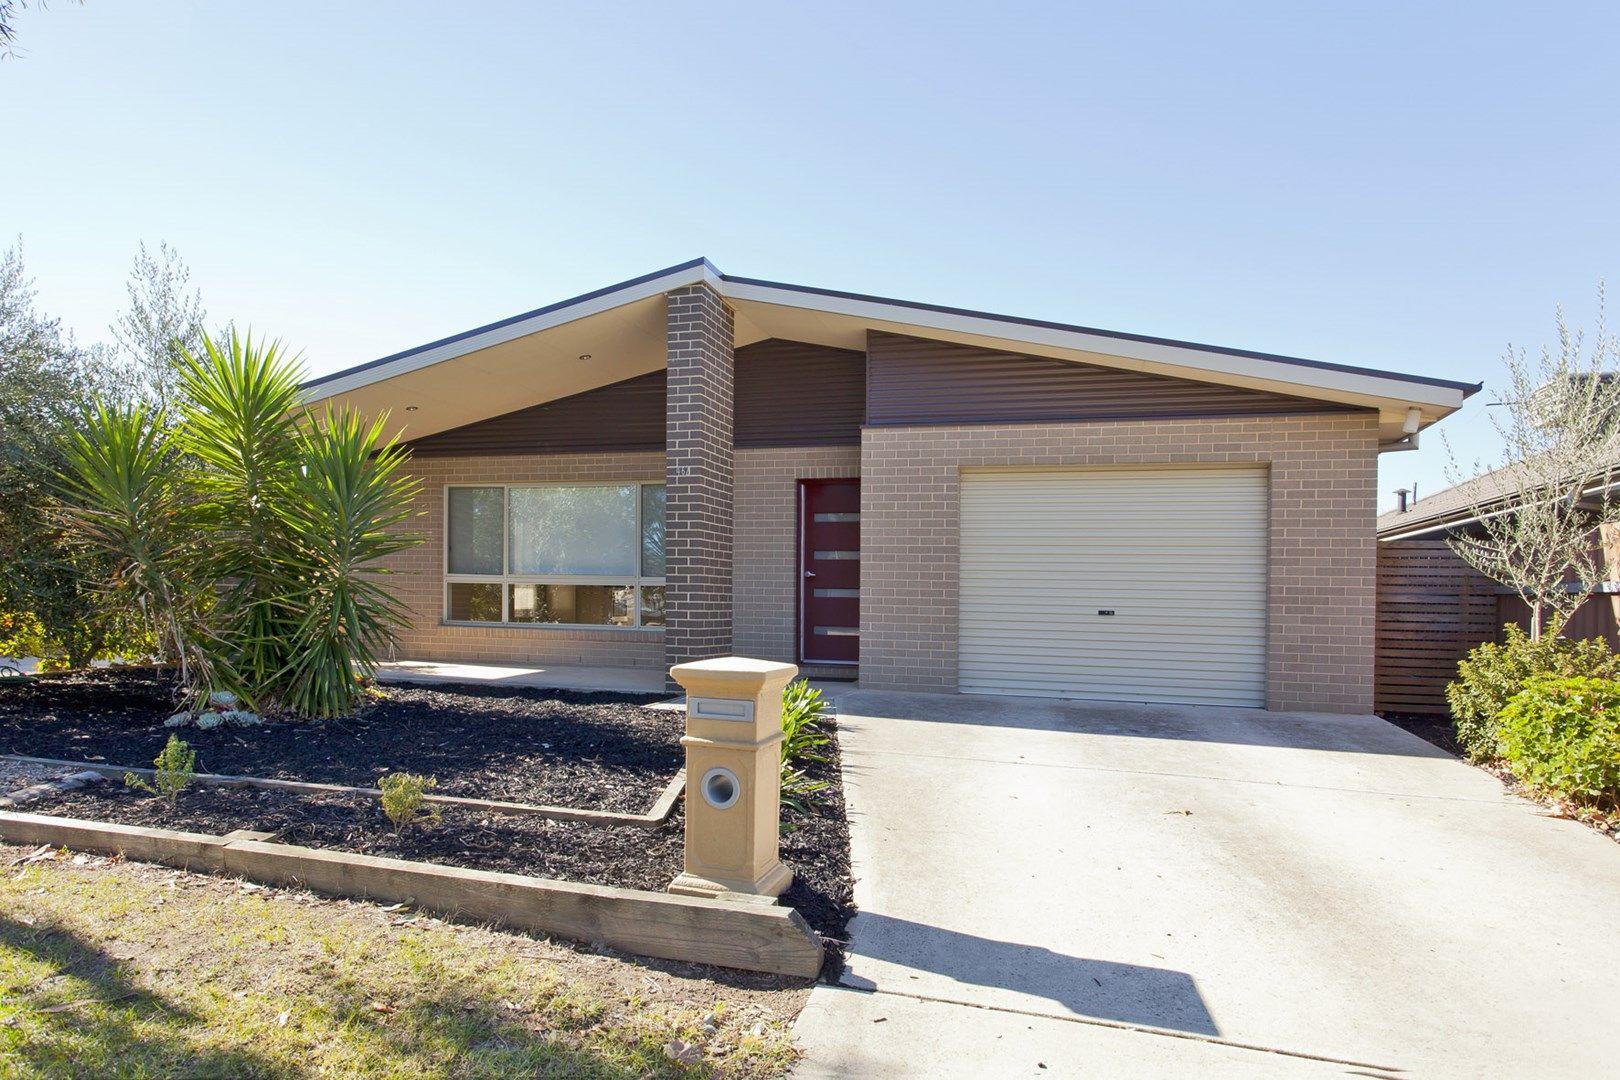 1/462 Parnall Street, Lavington NSW 2641, Image 0